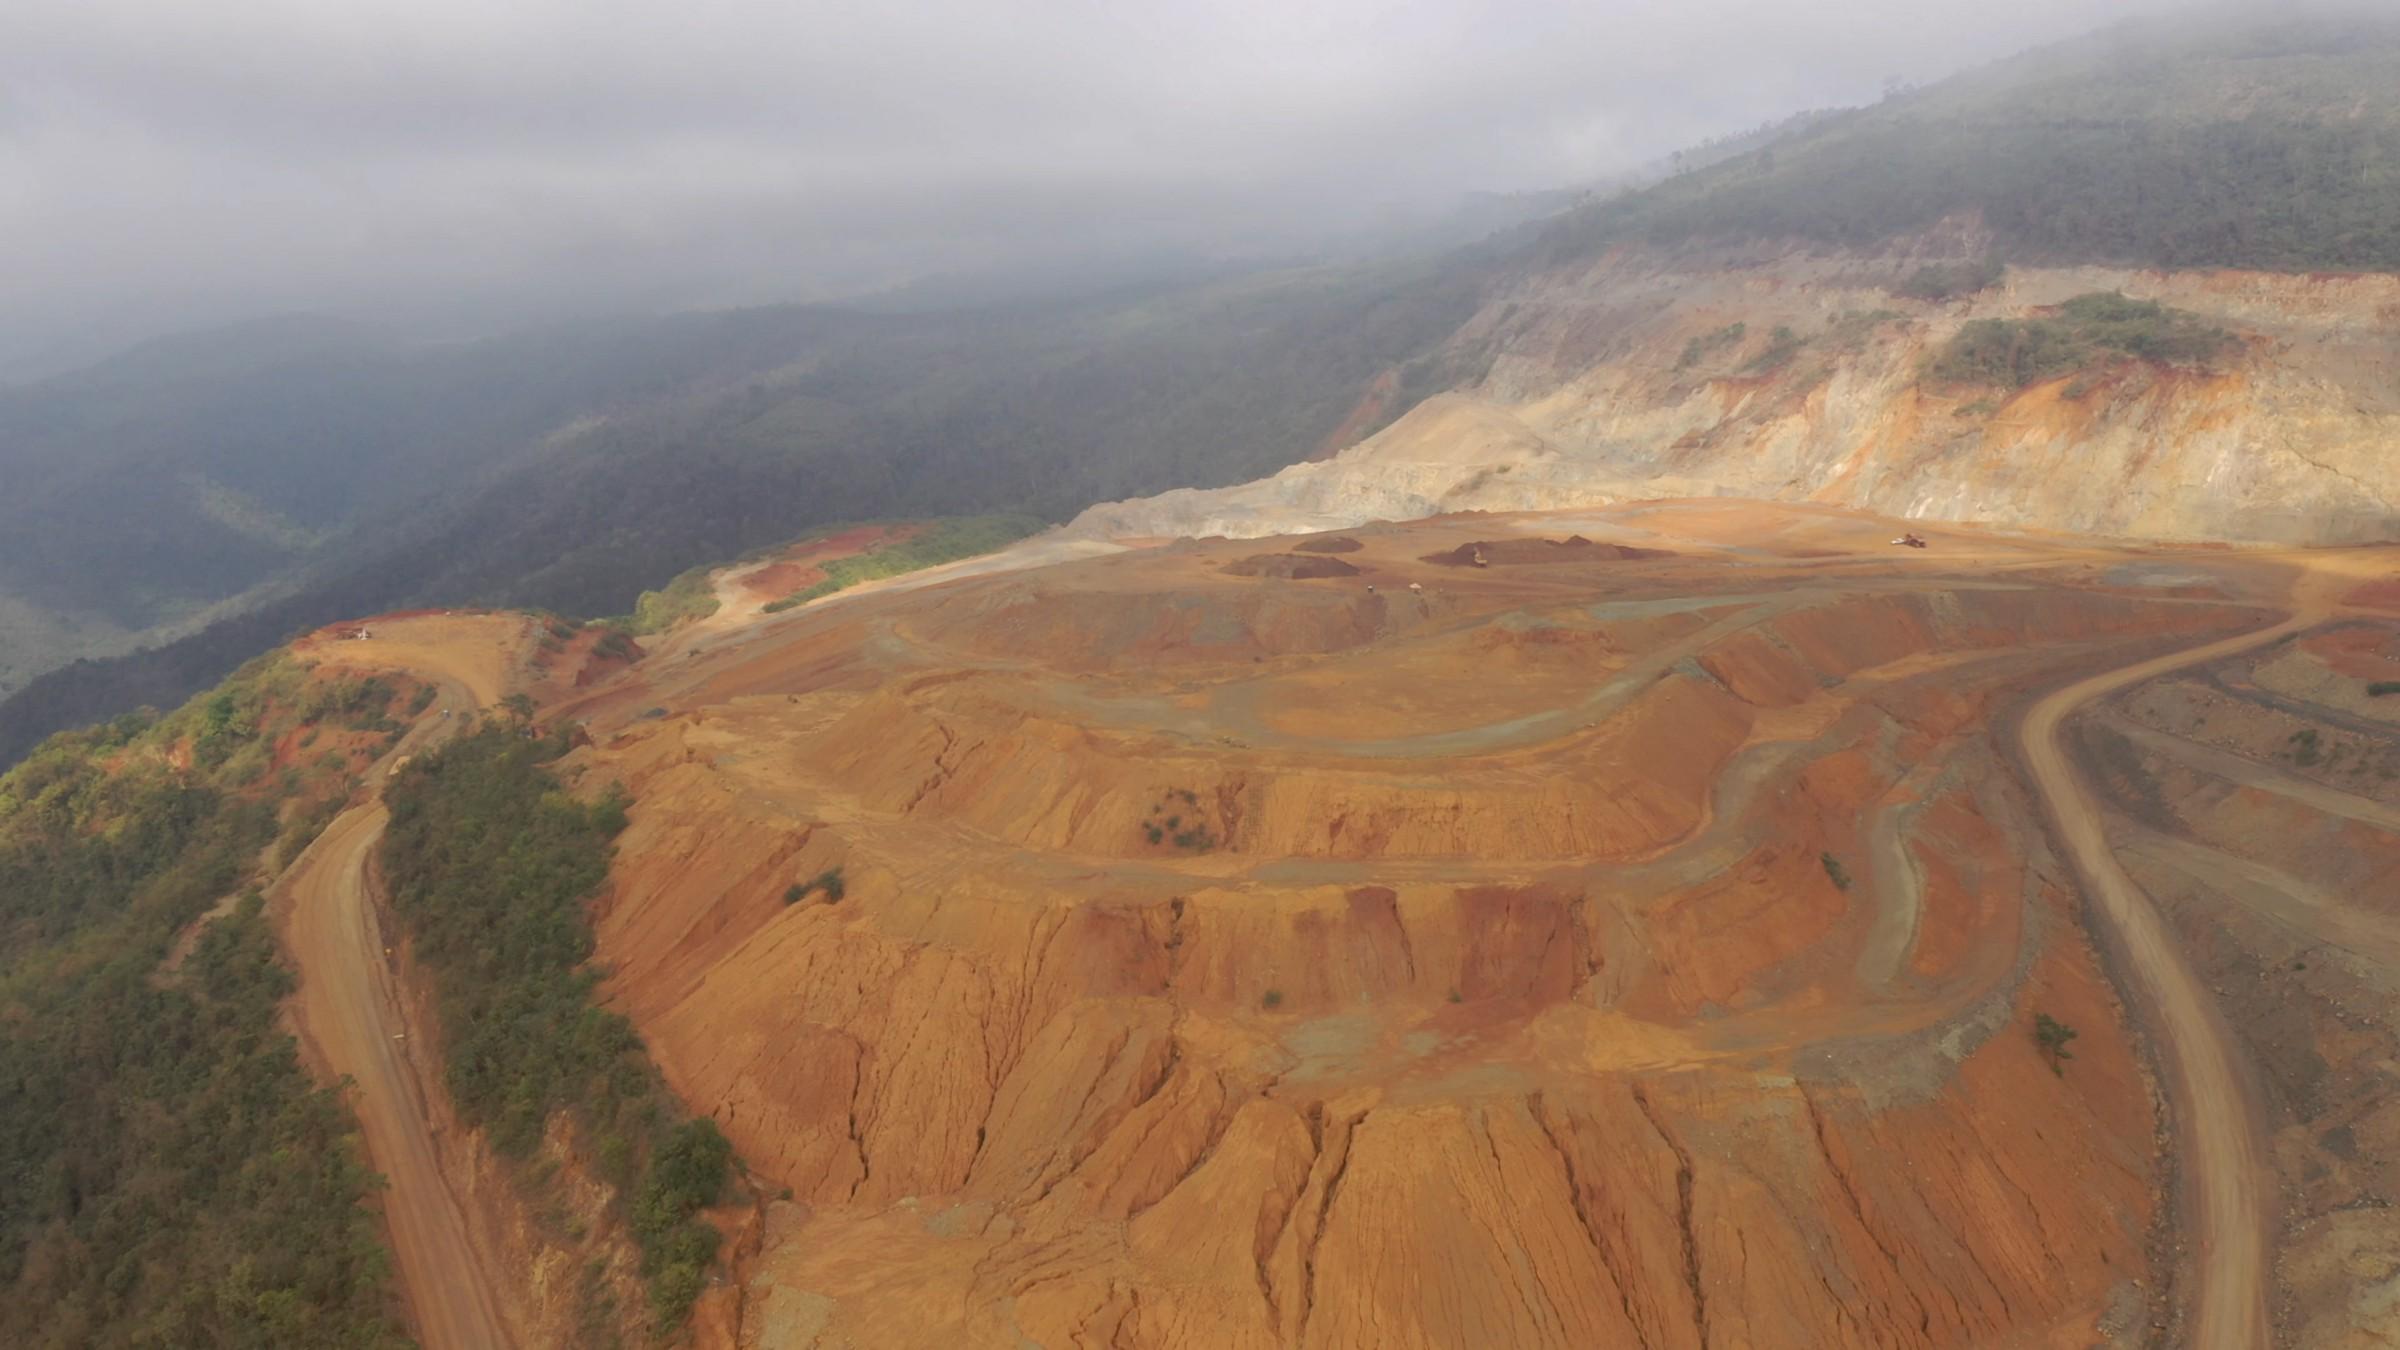 Cantera del proyecto minero Fenix de la empresa ruso suiza Solway Investment Group, operada por la empresa rusa CGN — Pronico en El Estor Izabal. Foto: Forbidden Stories.